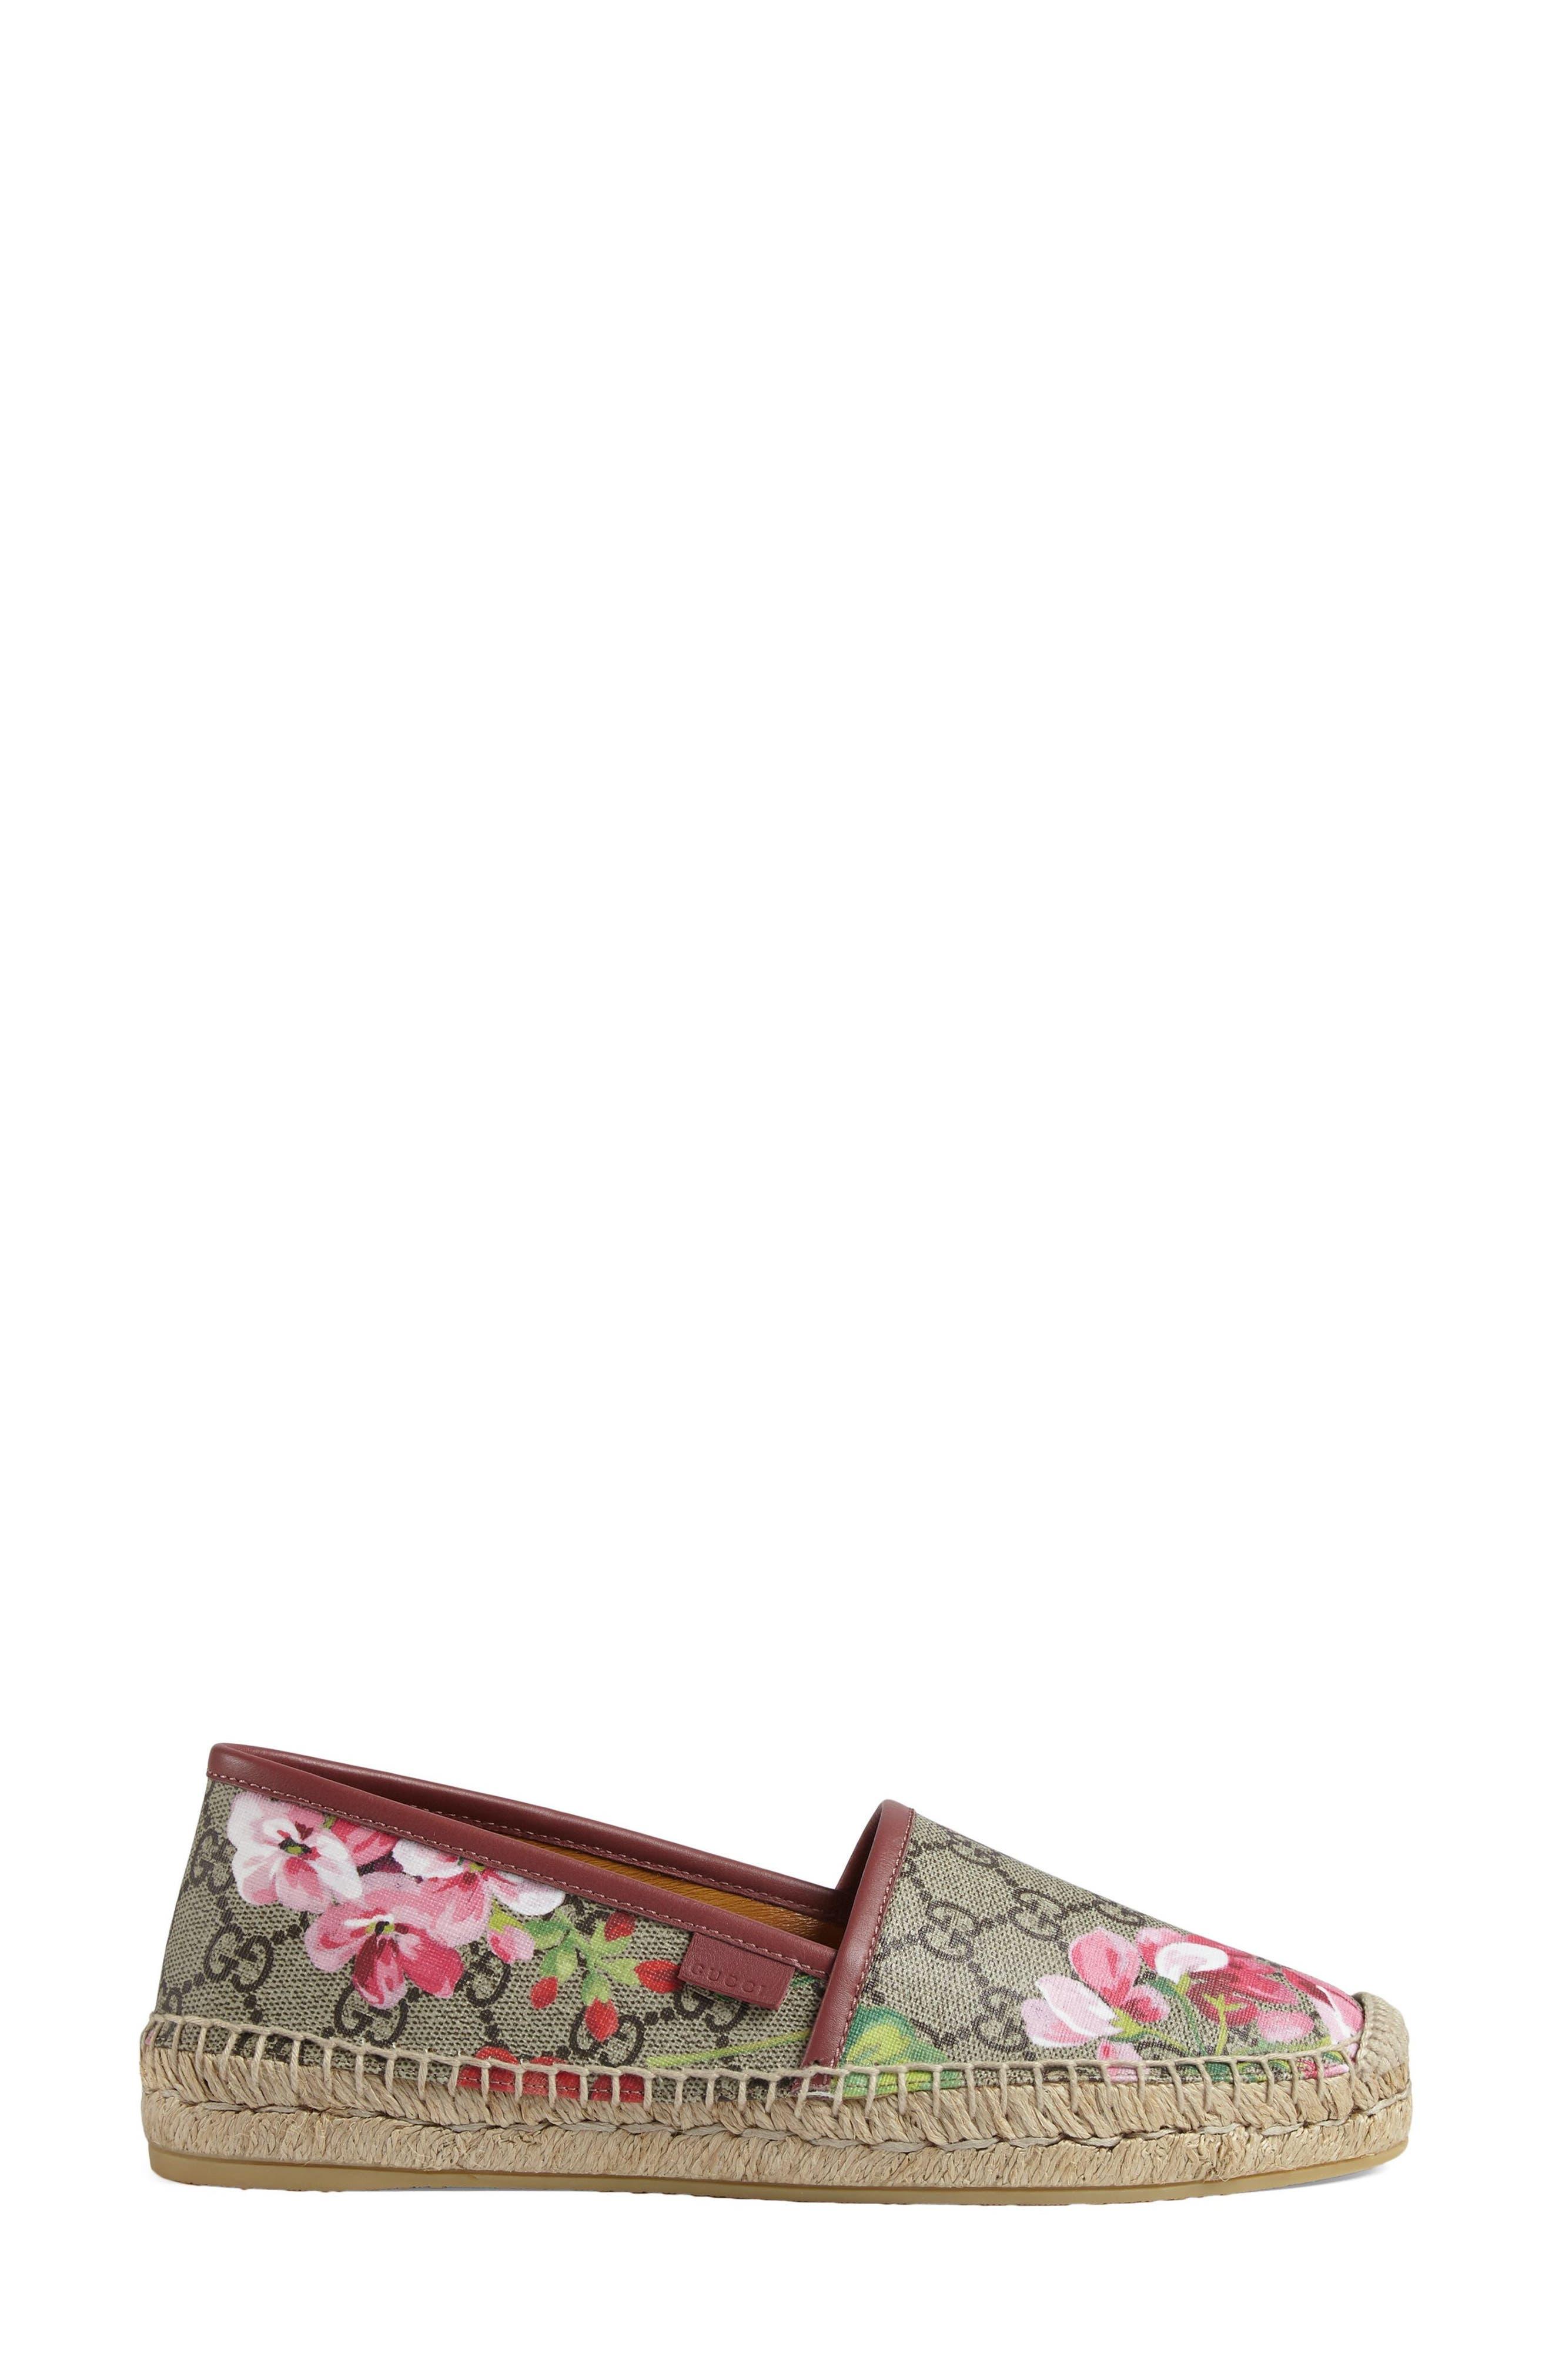 Alternate Image 1 Selected - Gucci 'Pilar' Espadrille Slip-On Flat (Women)